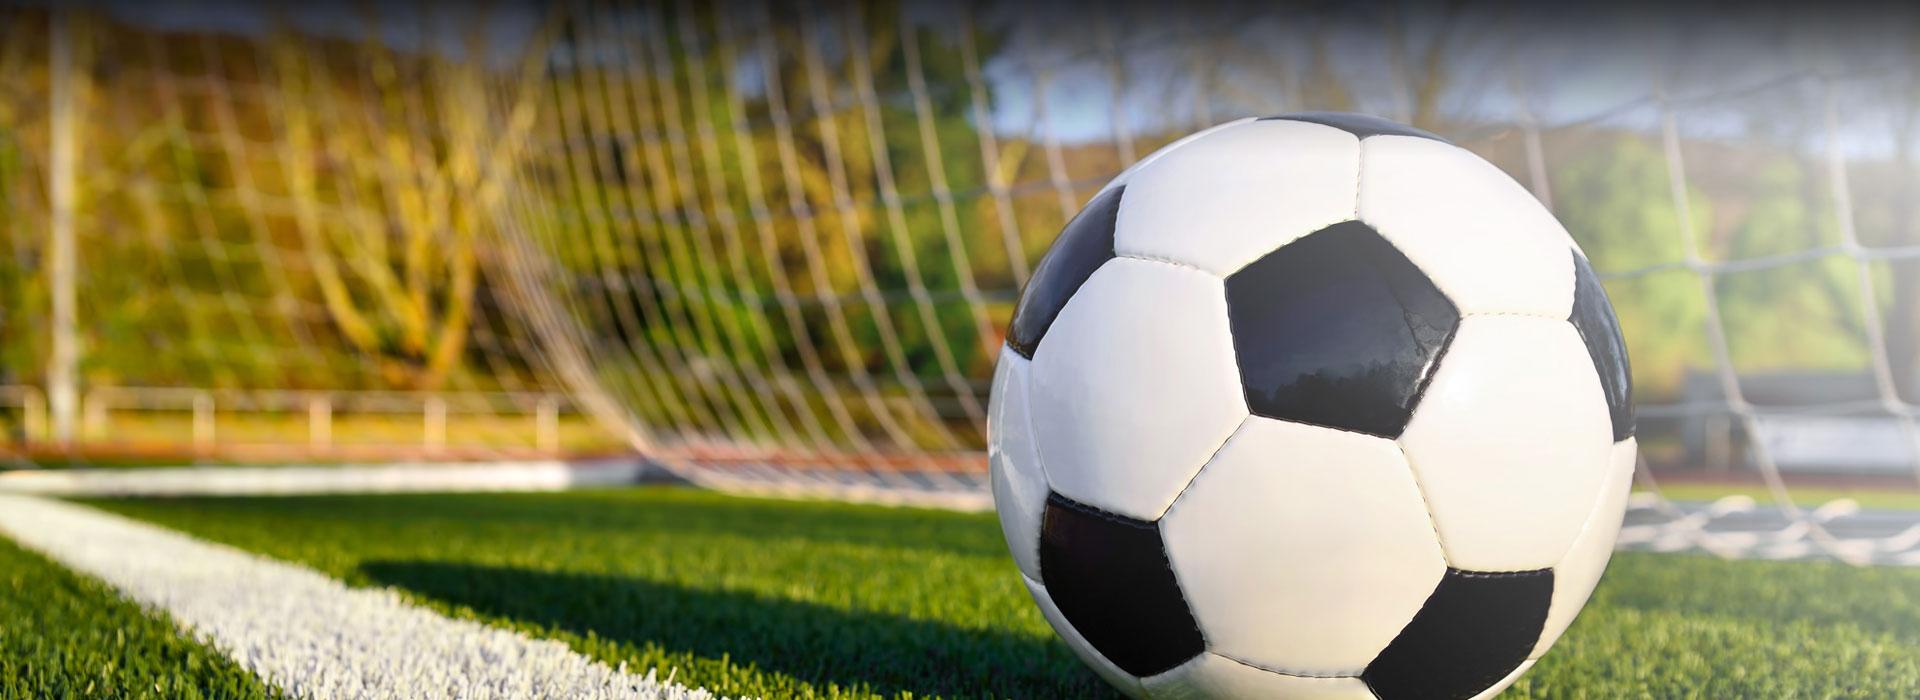 Sportfreunde nehmen am Kirmeszug 2018 teil